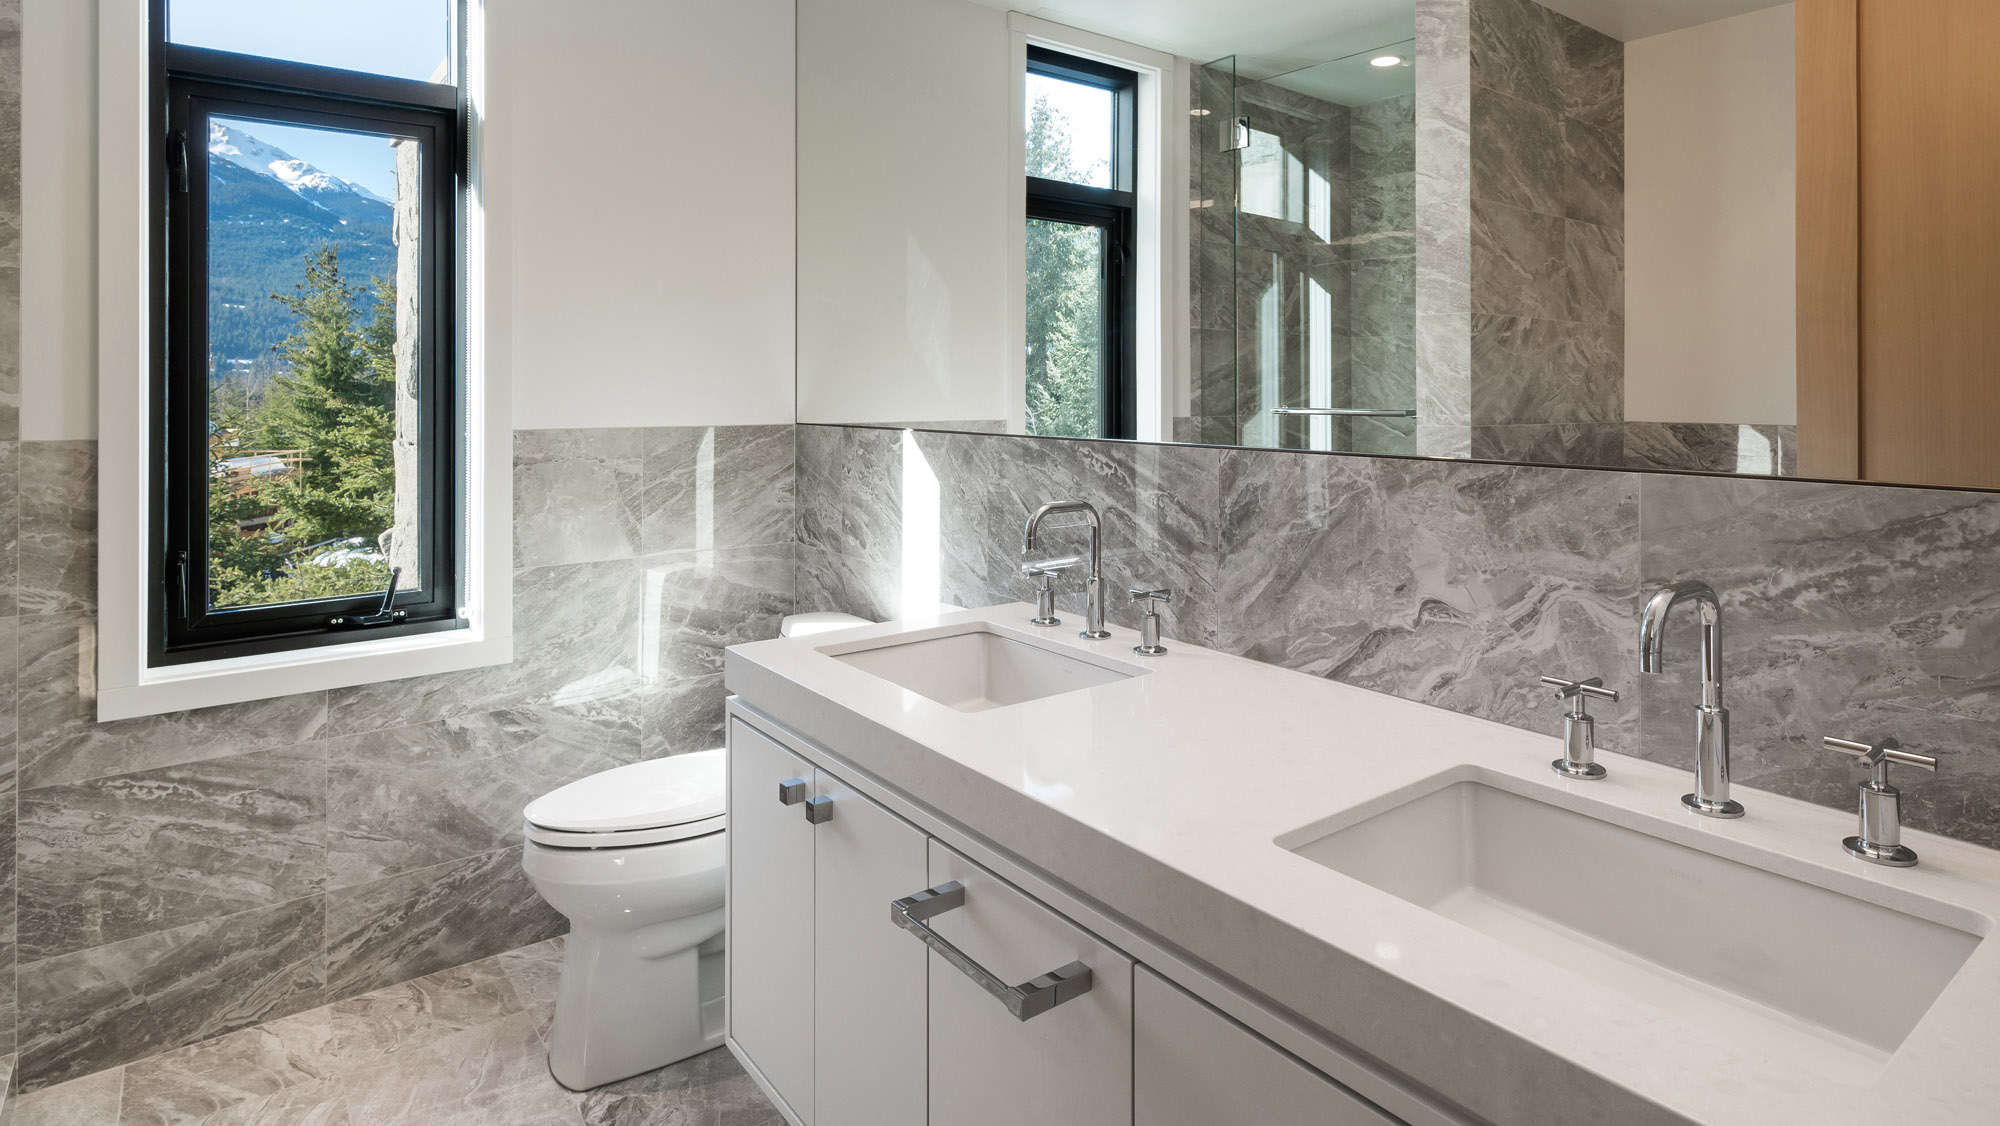 Столешница из кварцевого агломерата для ванной комнаты — Modern Acrylic Stone